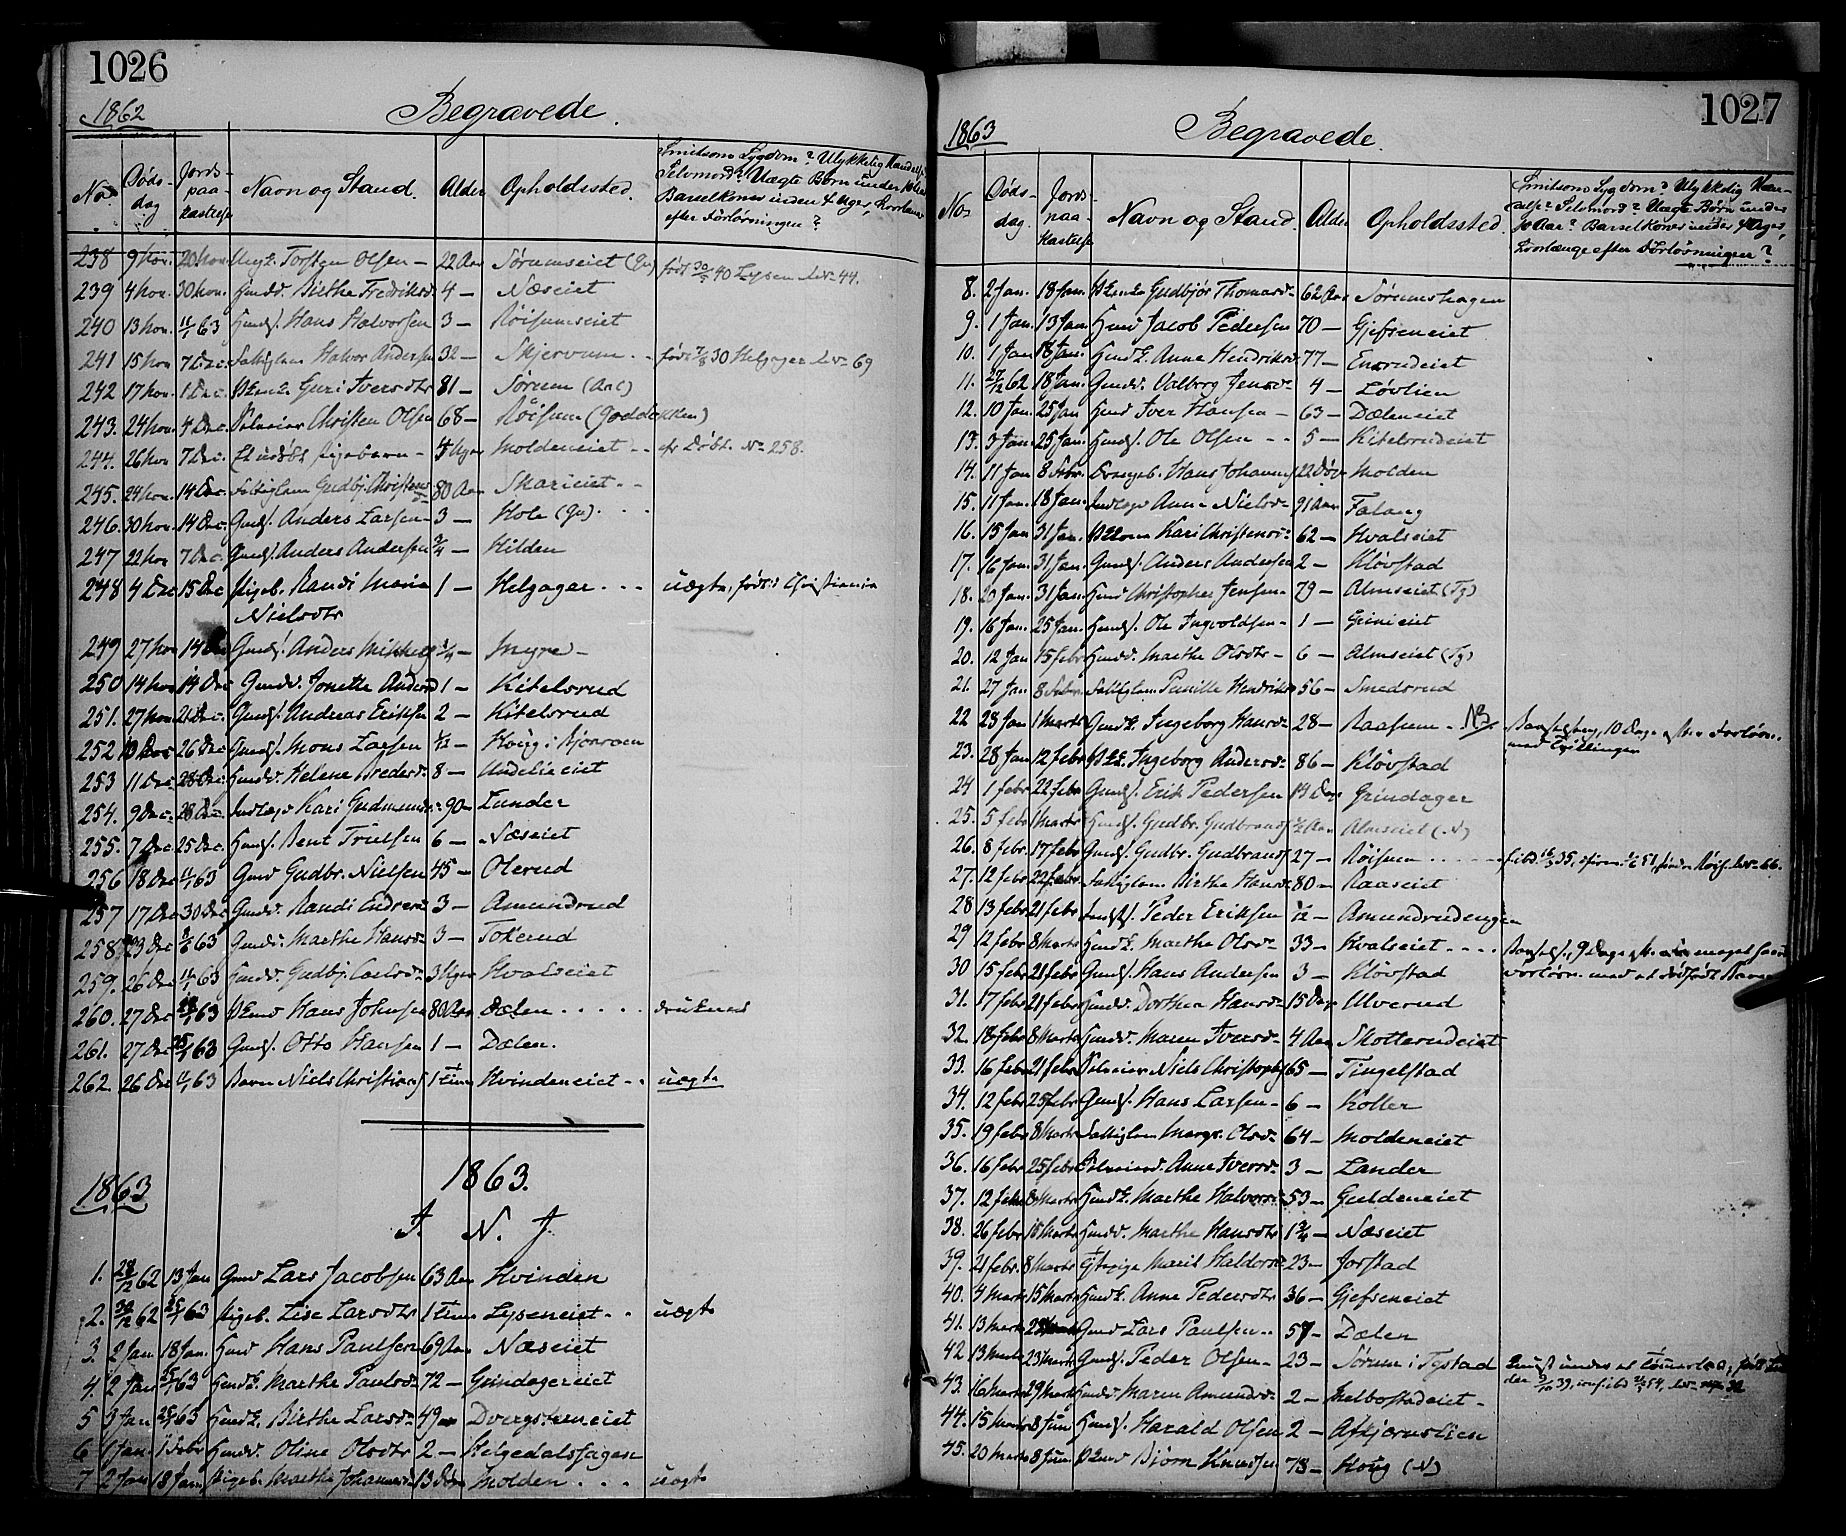 SAH, Gran prestekontor, Ministerialbok nr. 12, 1856-1874, s. 1026-1027